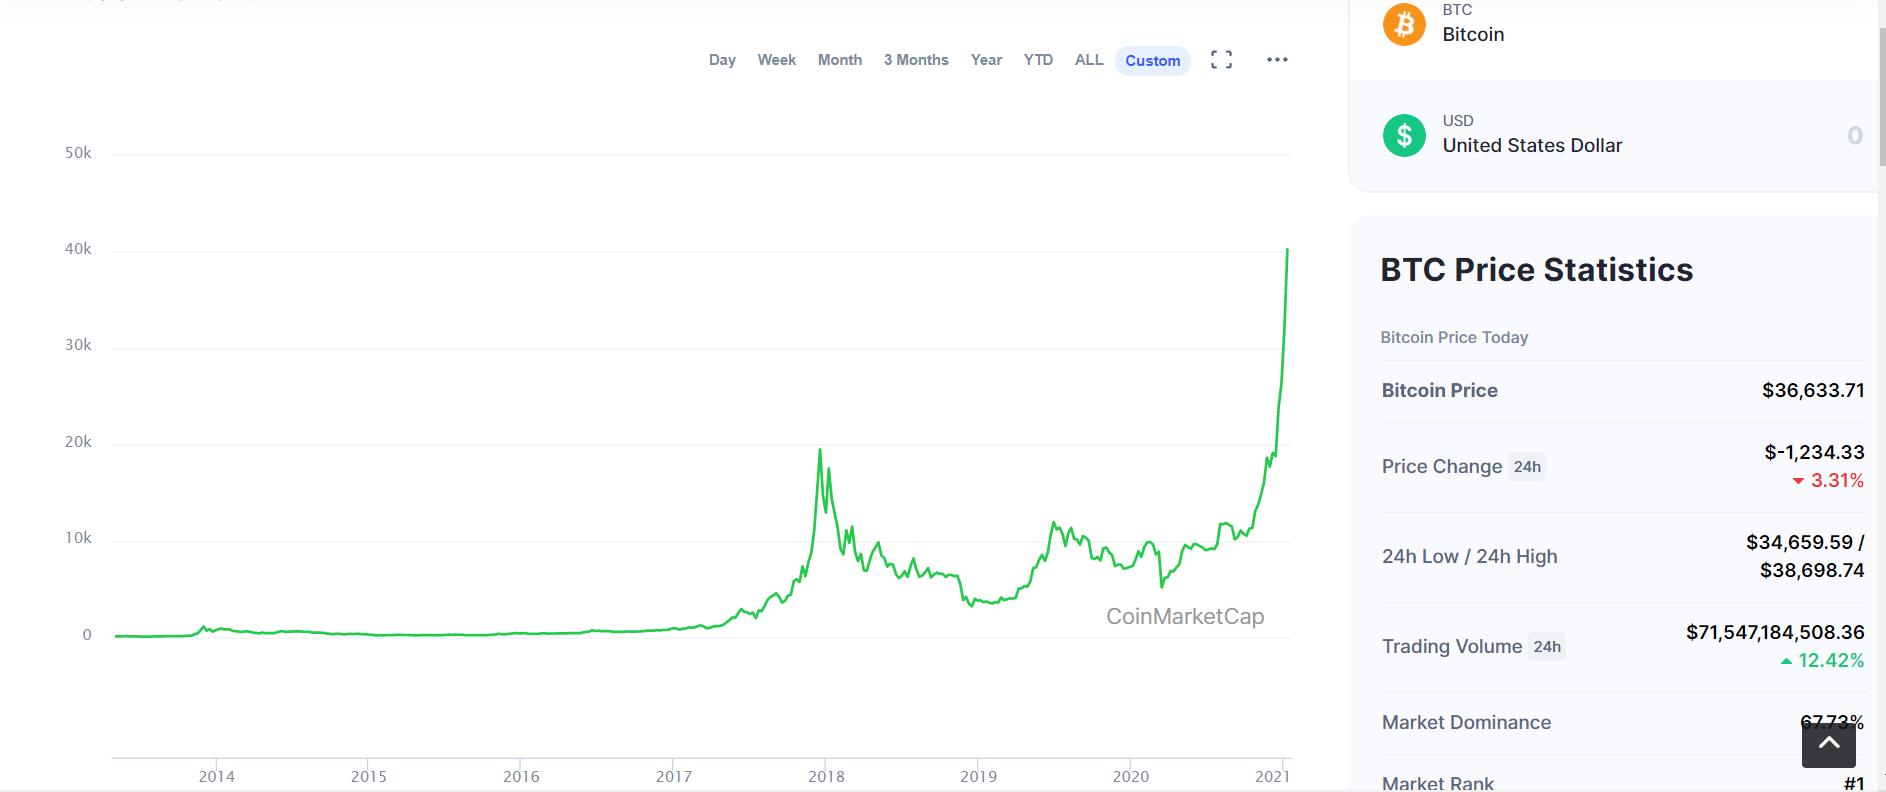 Biểu đồ giá đồng Bitcoin